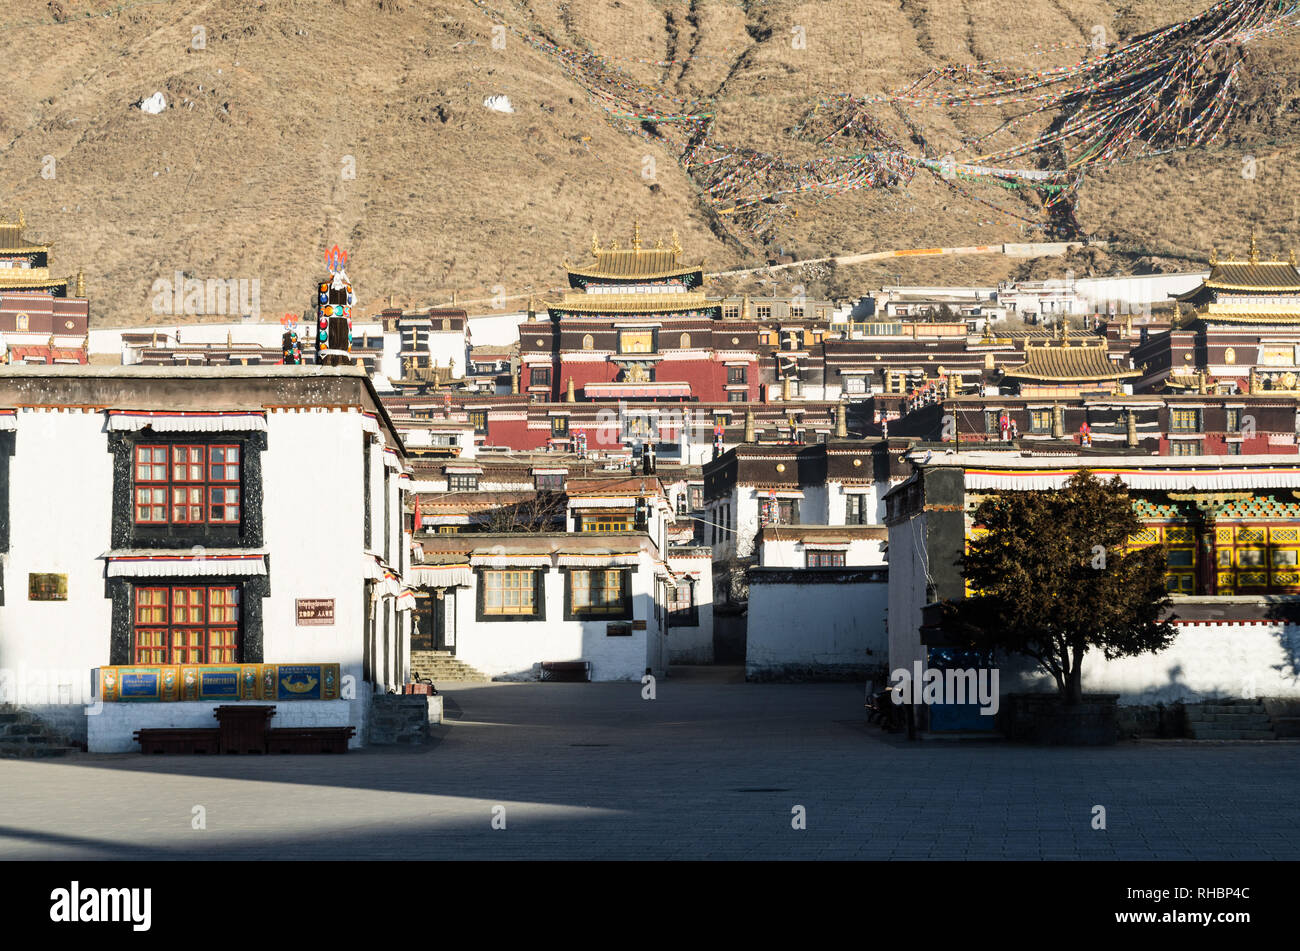 Le monastère de Tashi Lhunpo, Shigatse, Tibet Photo Stock